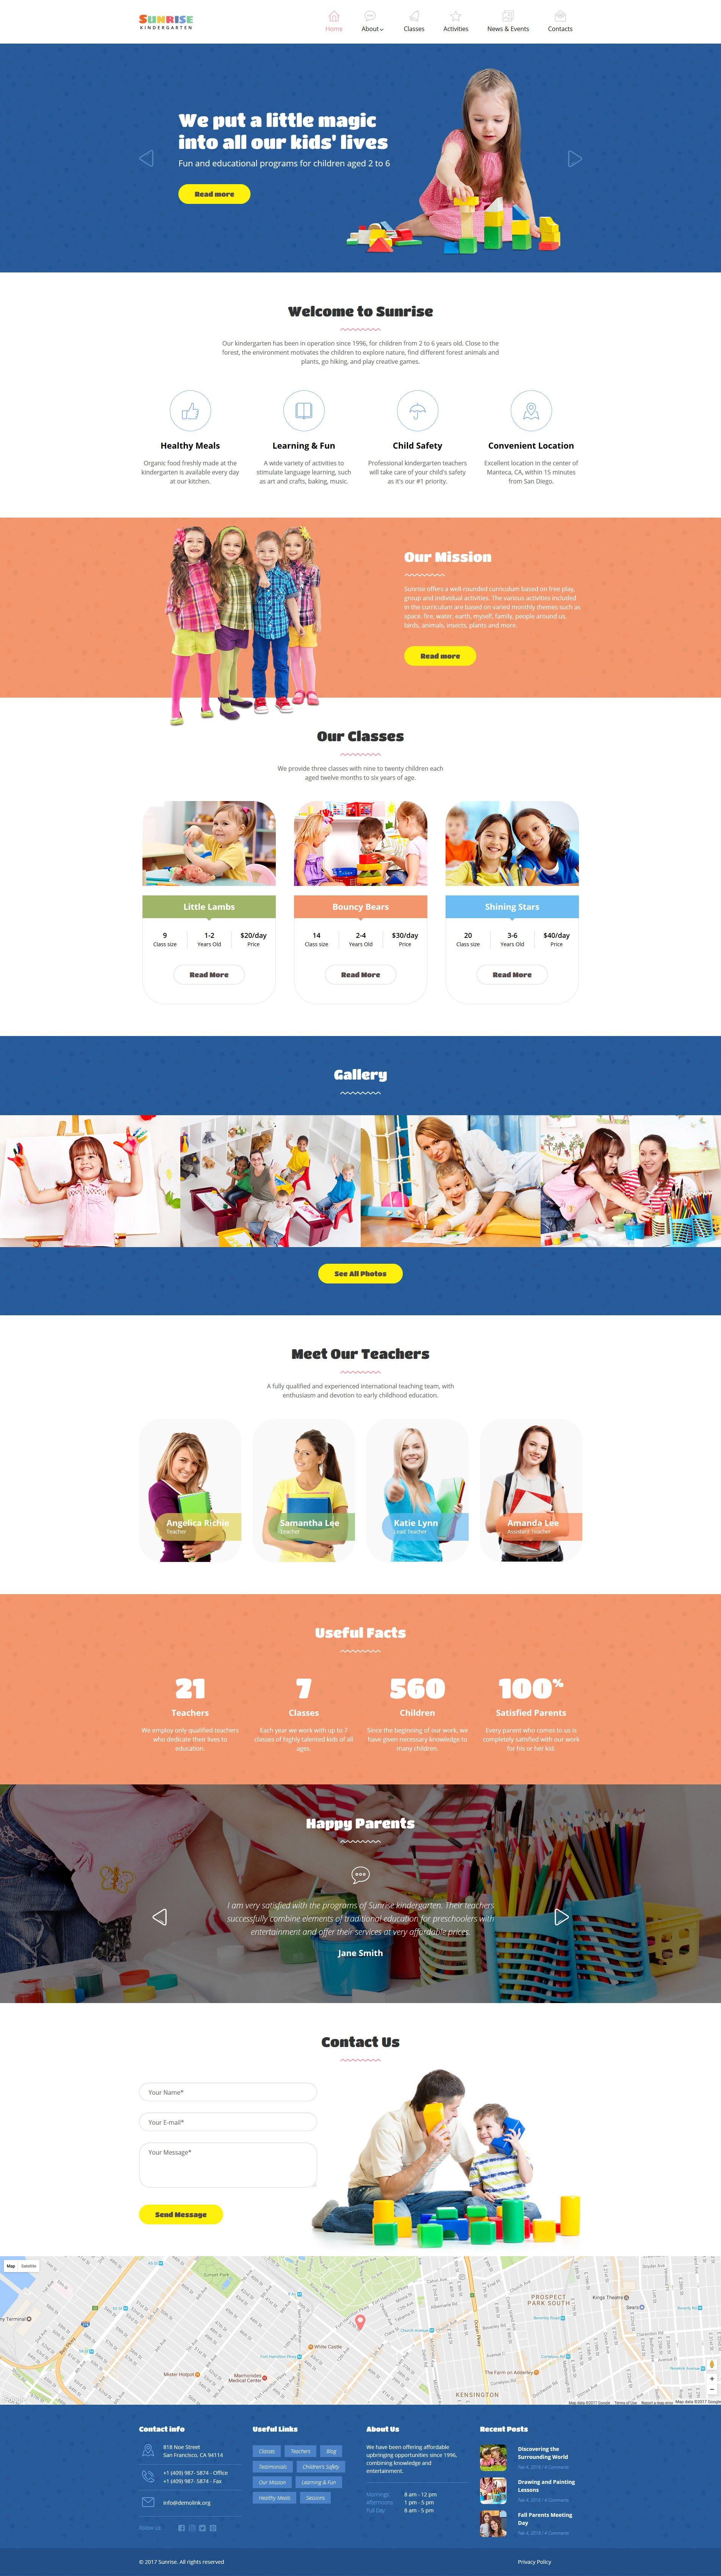 Sunrise - Kids Center & Kindergarten Responsive Template Web №58894